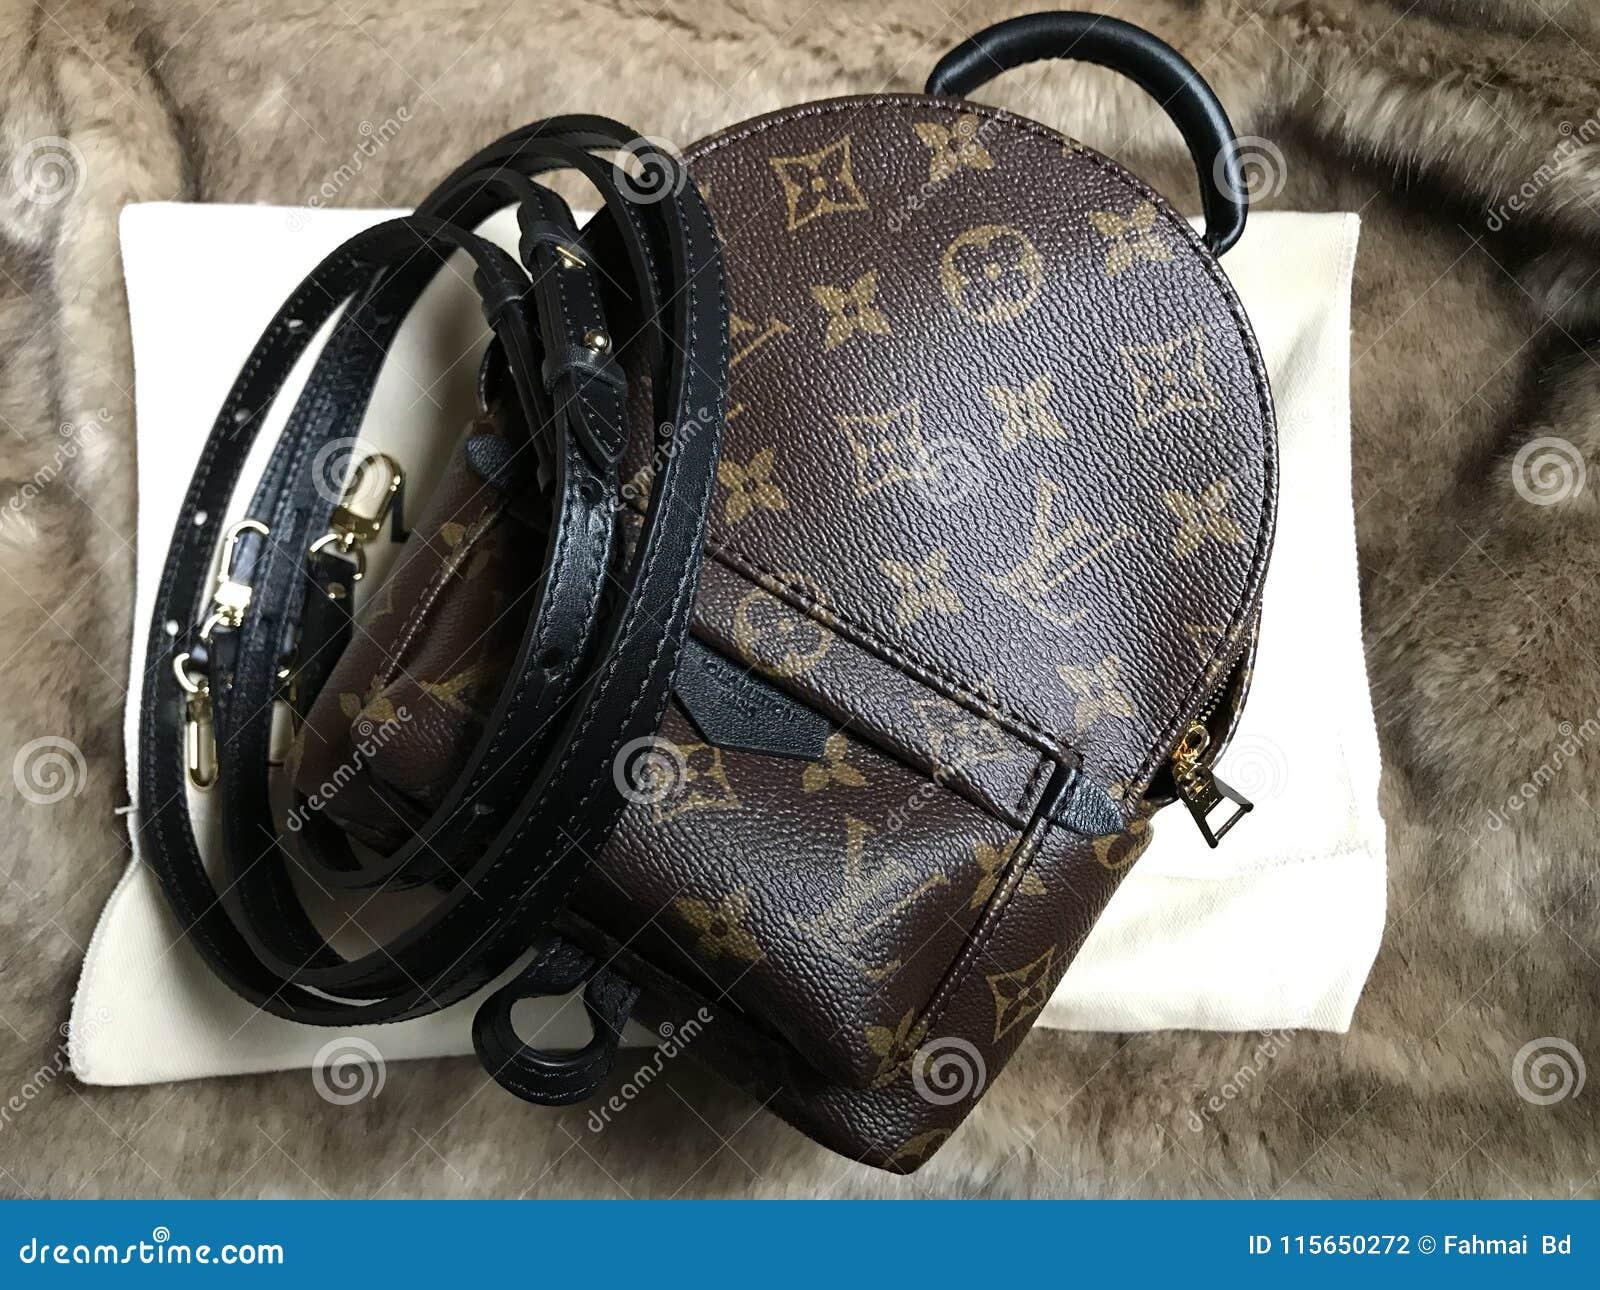 Louis Vuitton Mini Palm Spring Luxury Shoppingbag In Monogram ... 138824d39c4e9